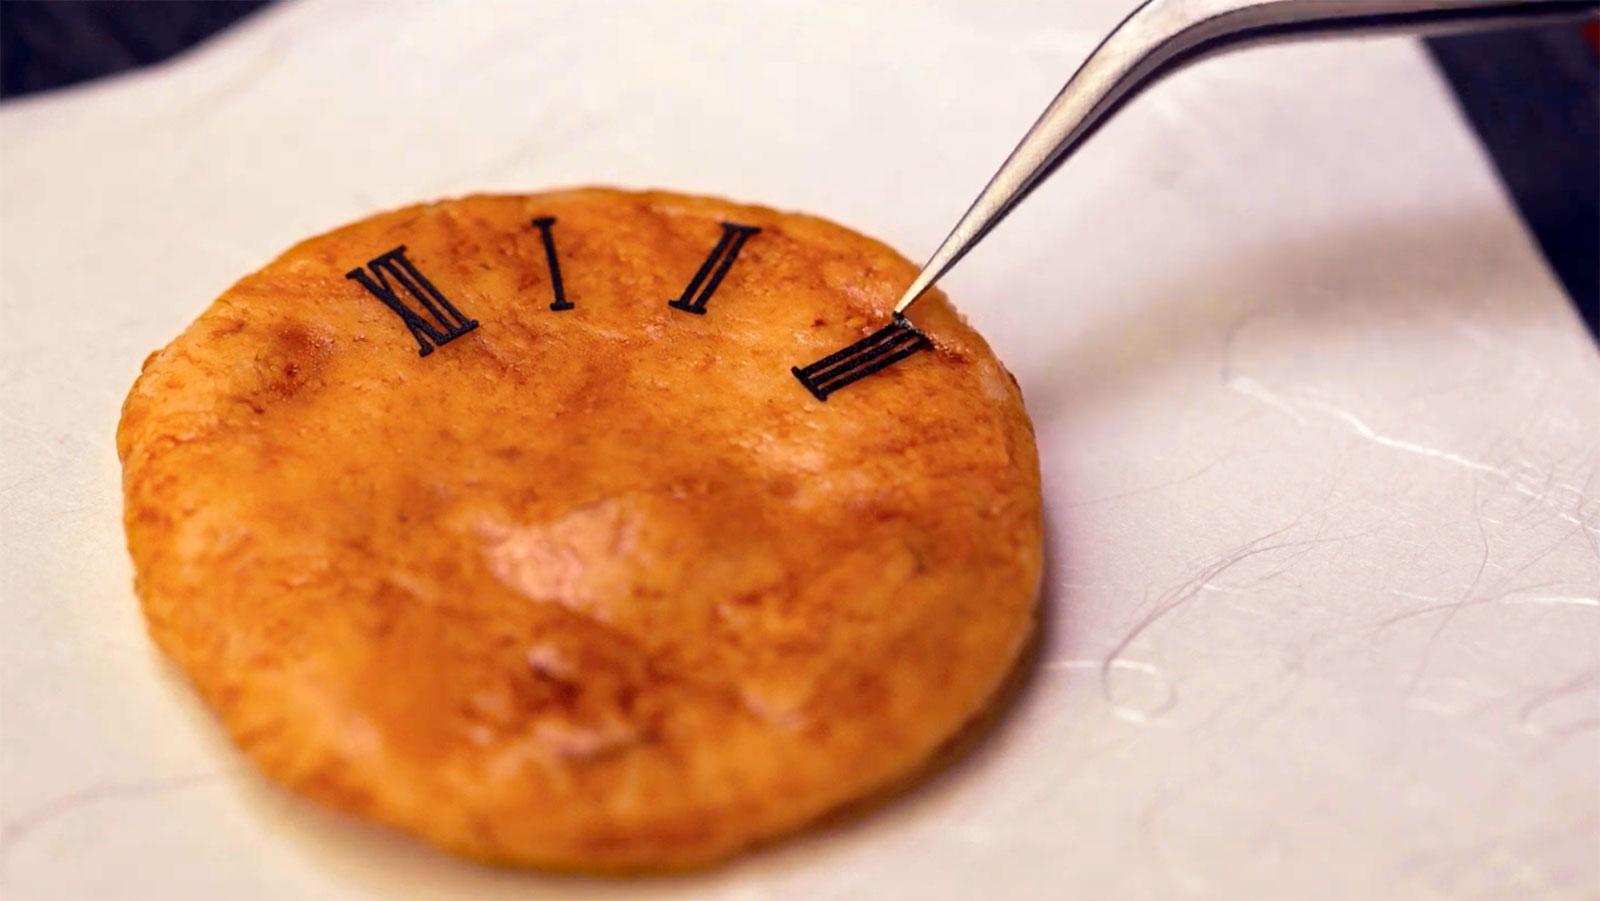 Seiko Presage Senbei rice cracker 1